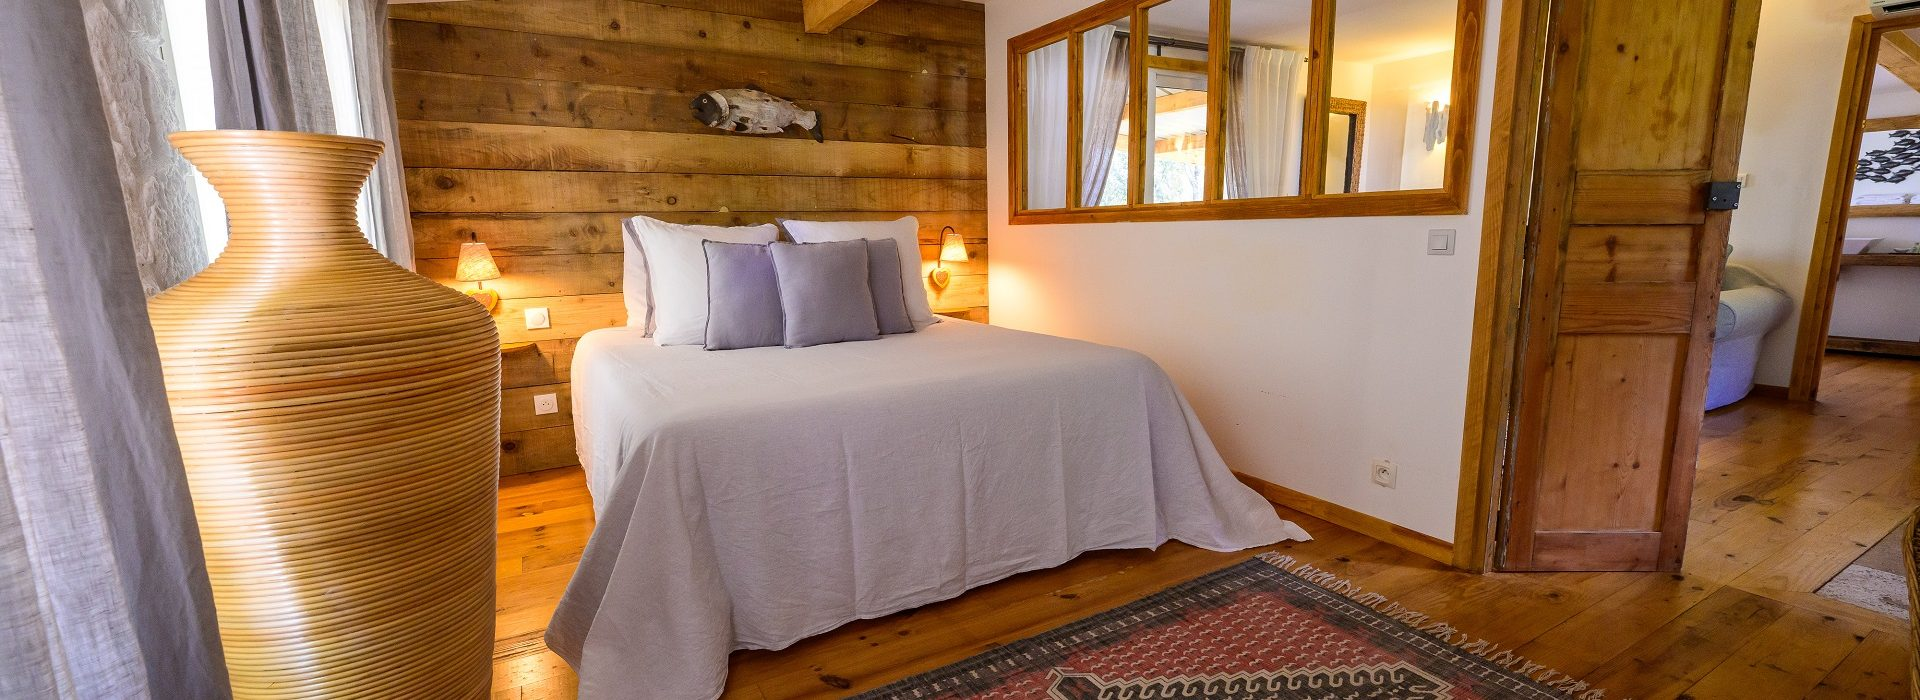 Maison en bois Chambre dhote luxe herault